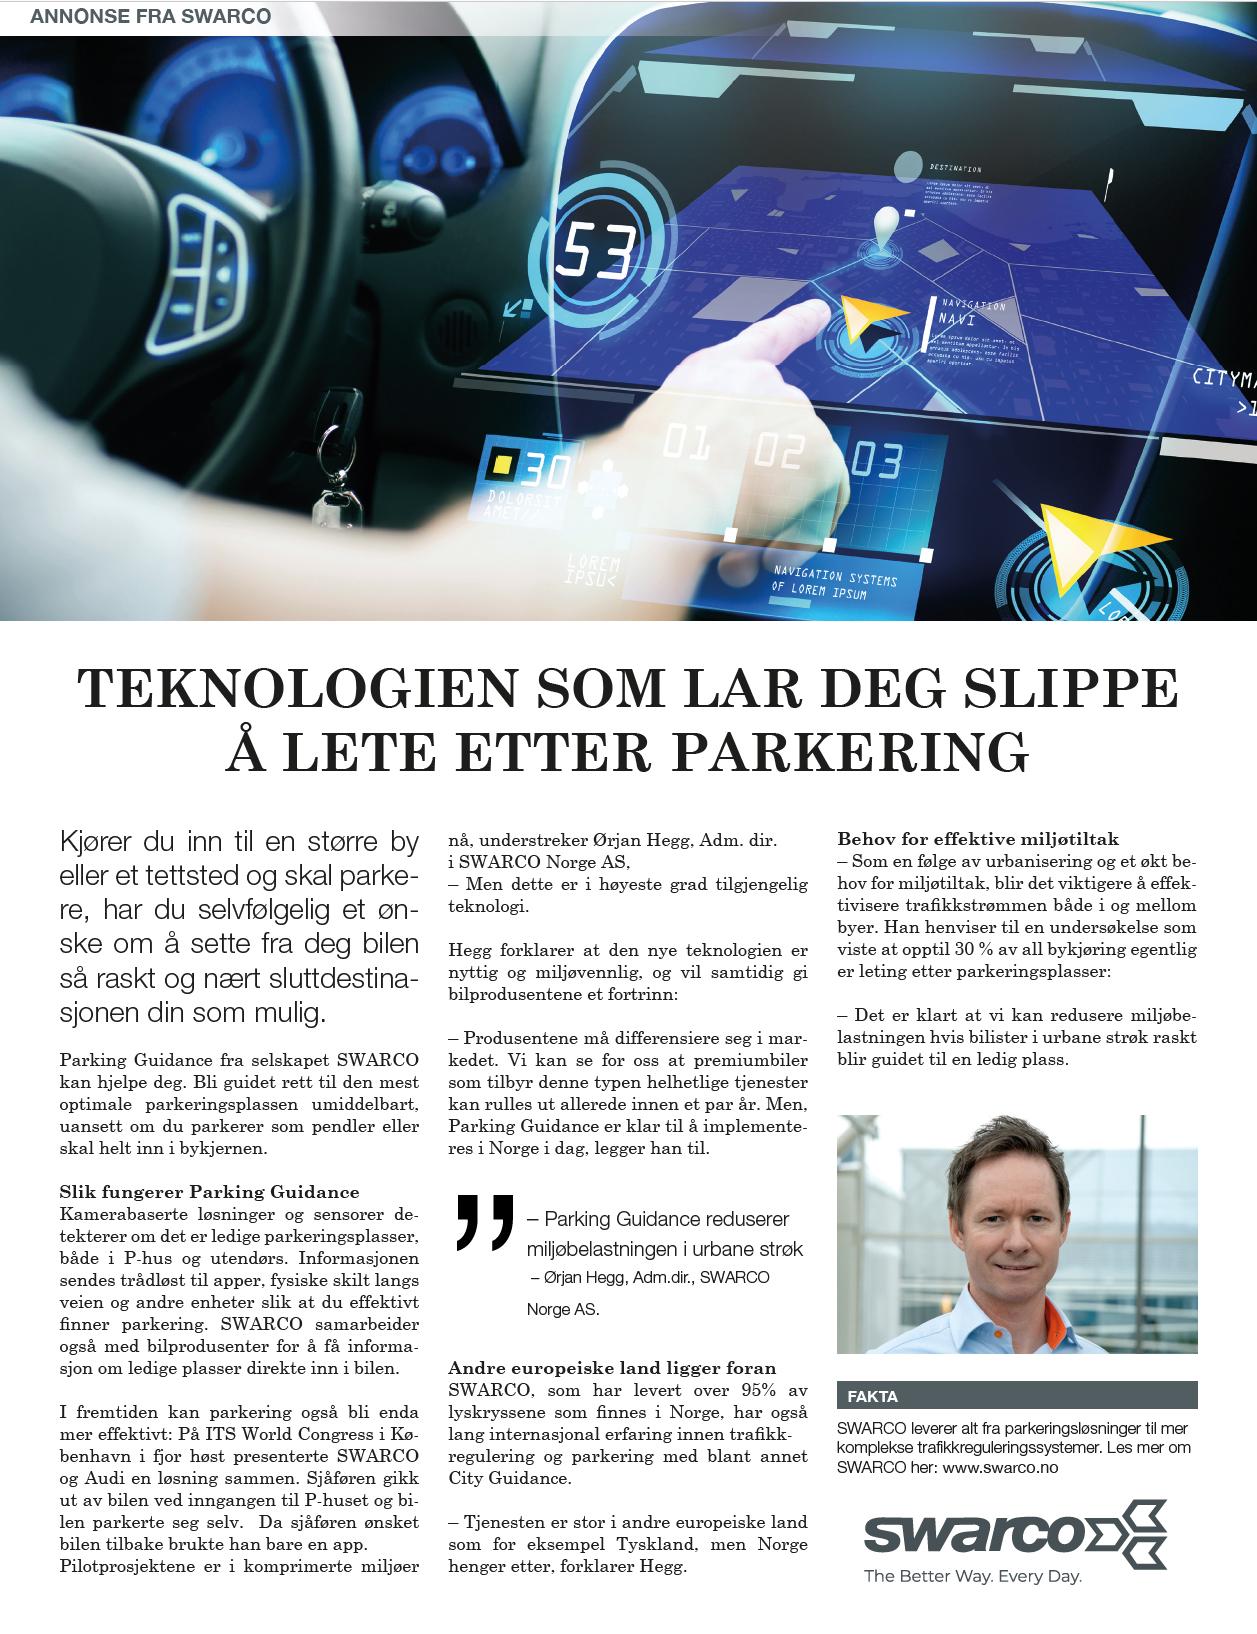 Teknisk Ukeblad Content AD SWARCO